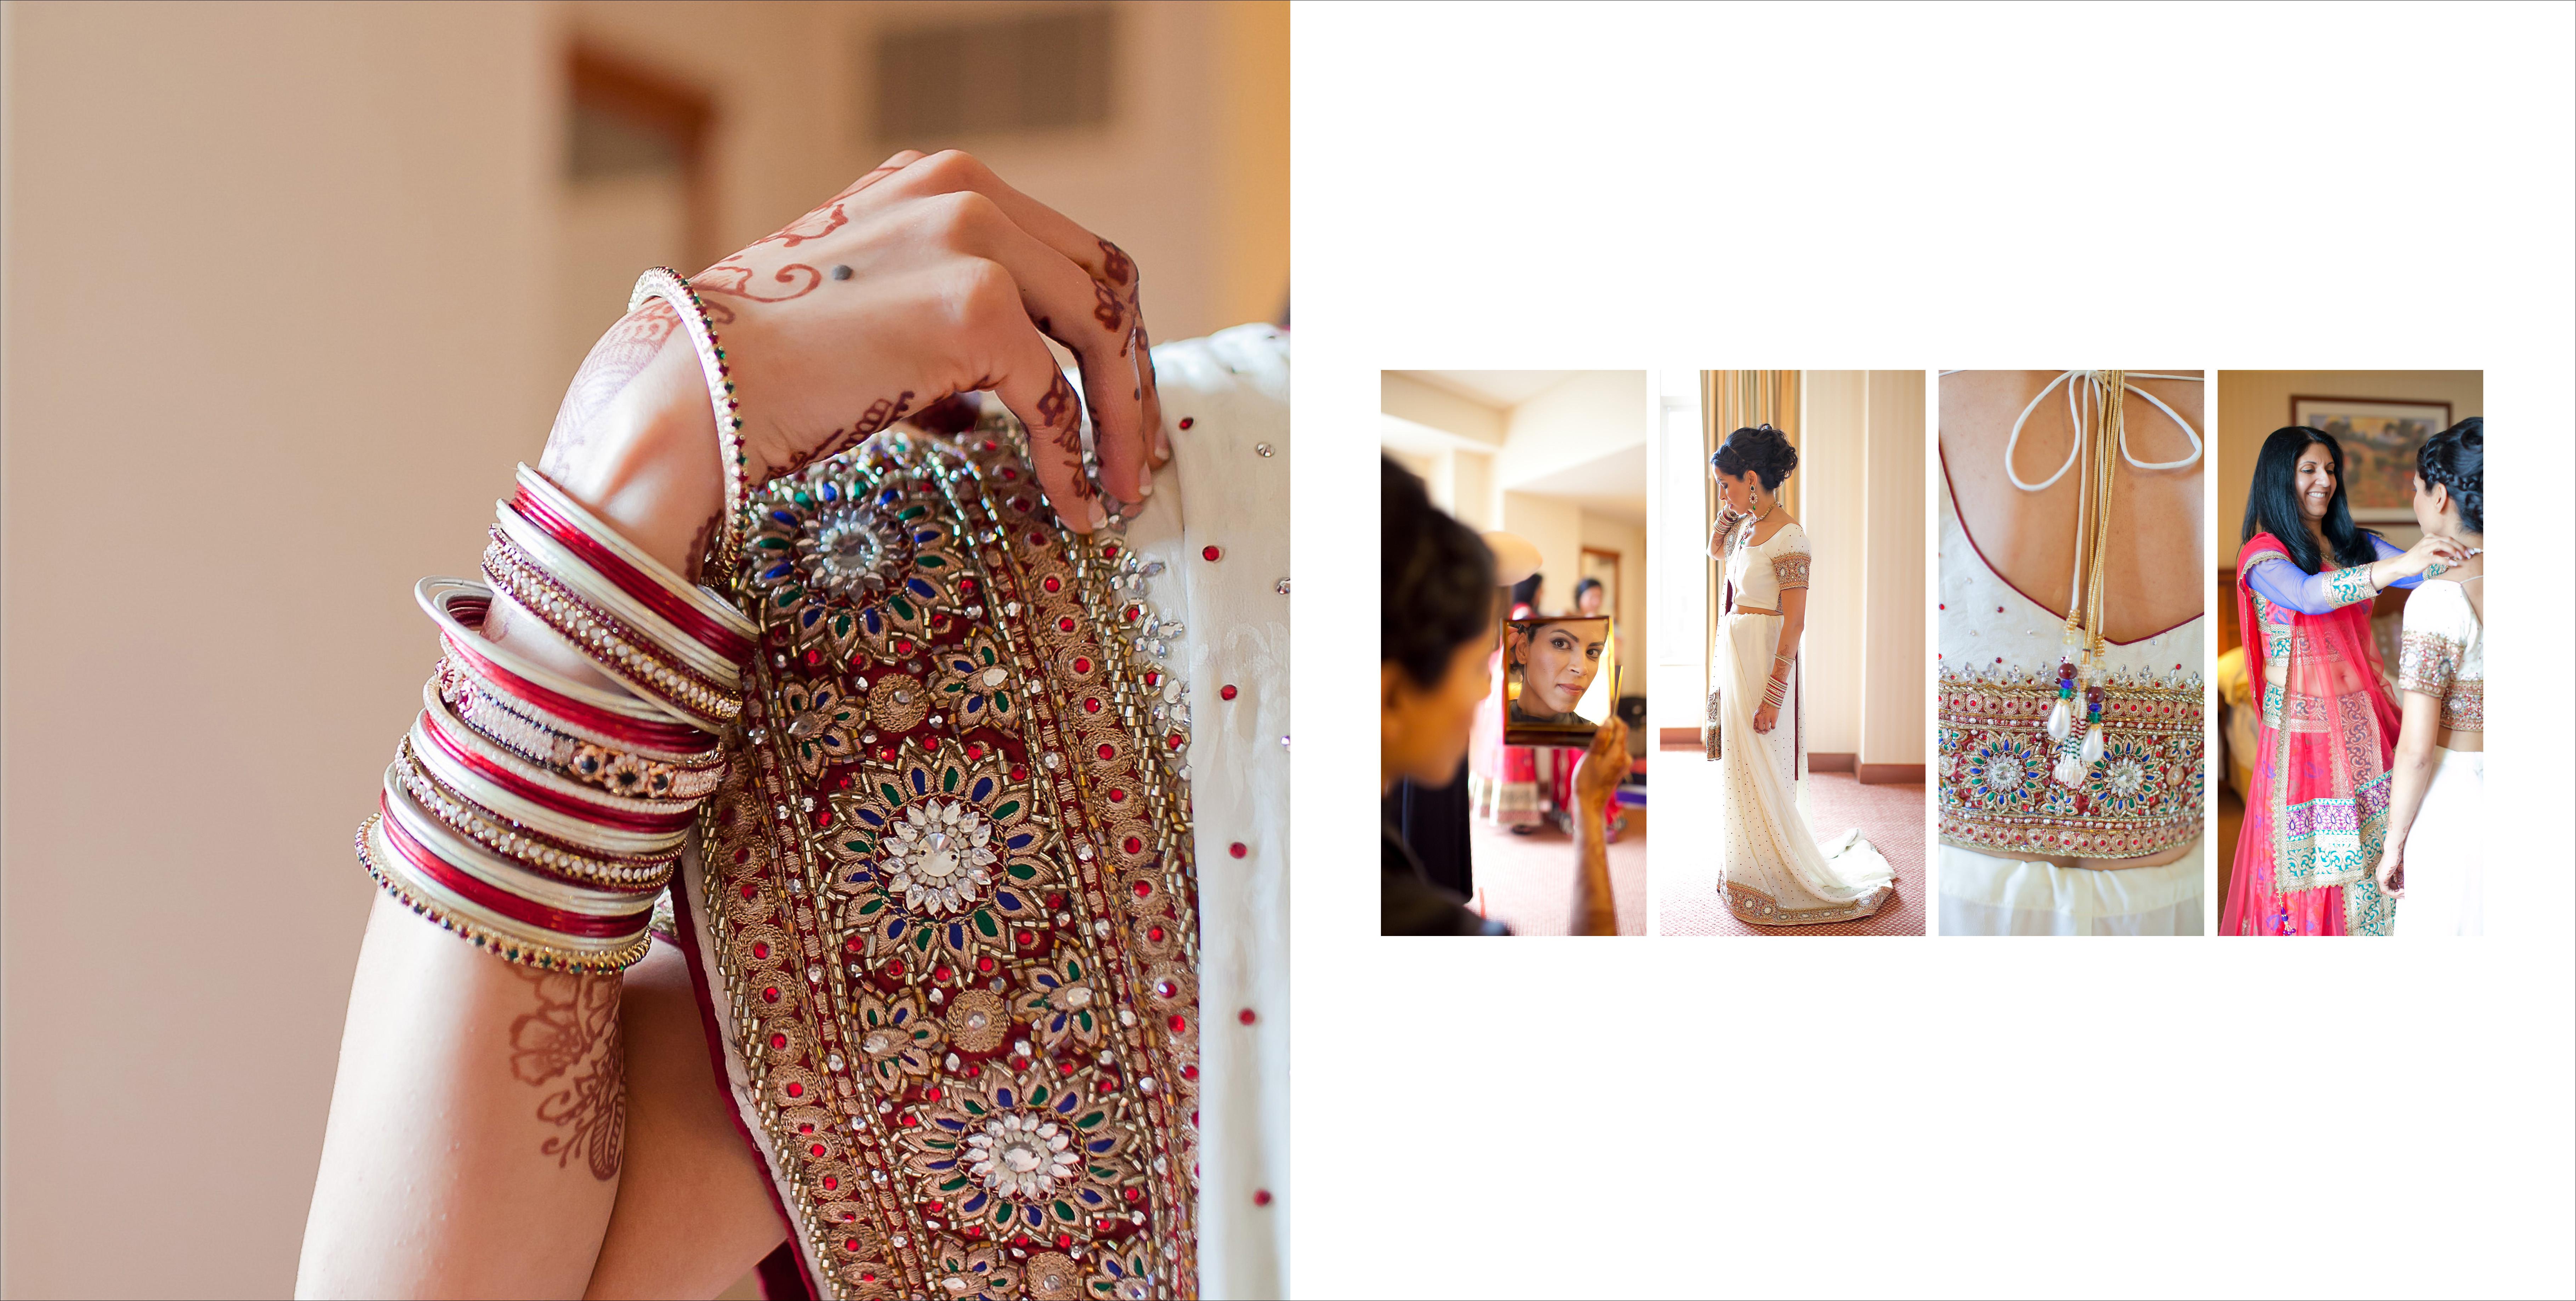 Best ideas about DIY Wedding Album . Save or Pin DIY Wedding Album Design 5 Steps Now.